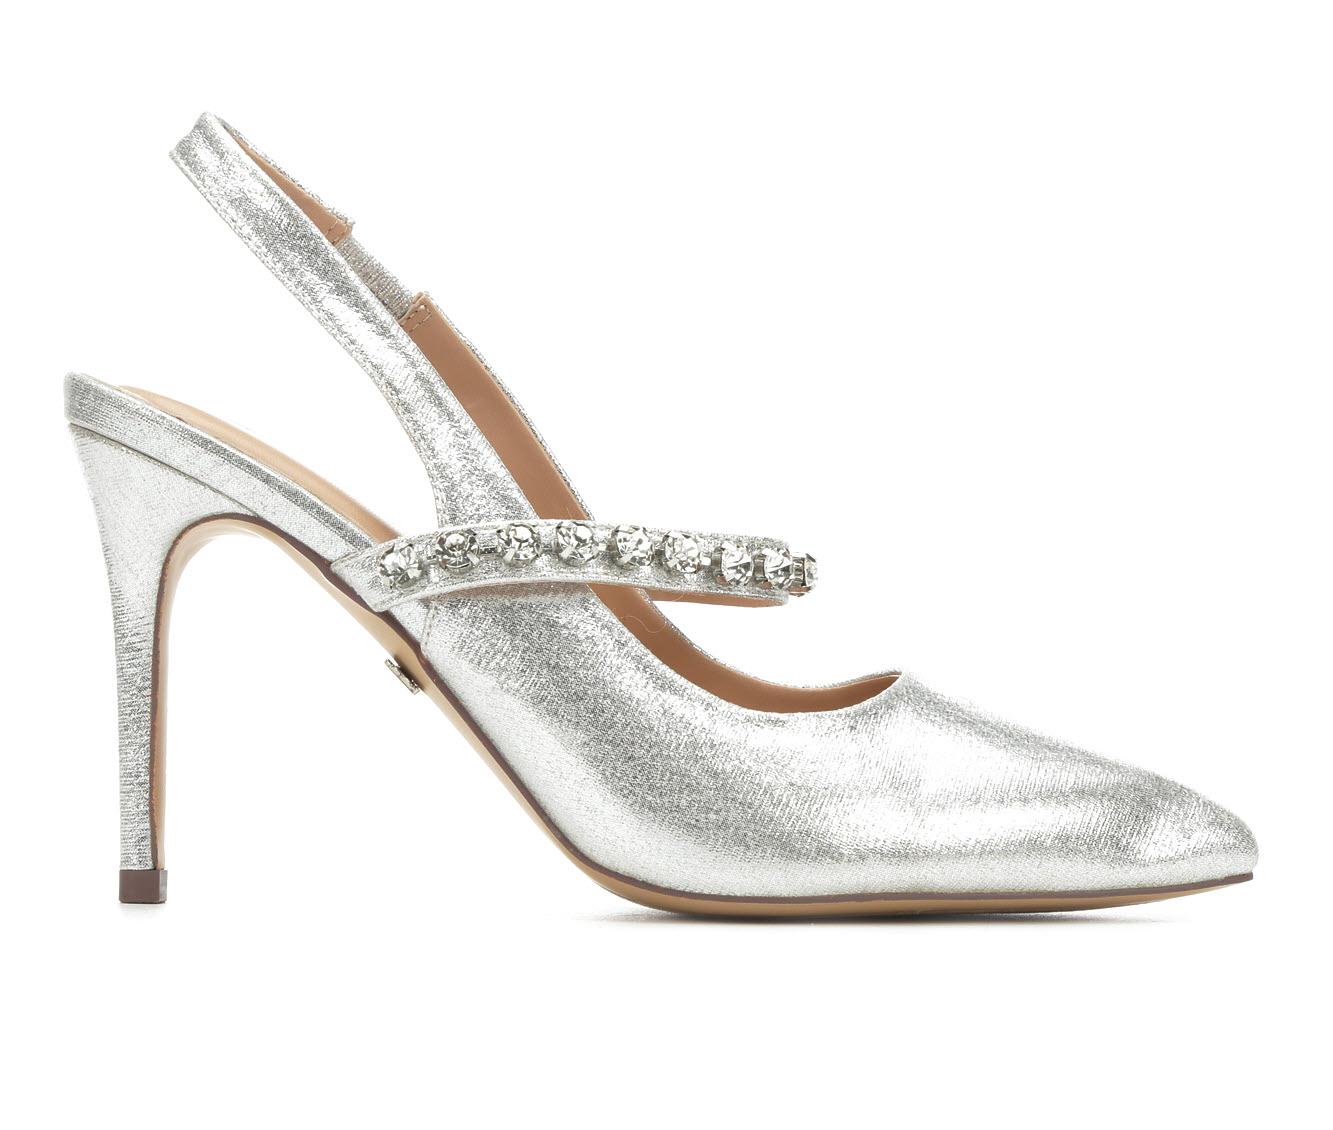 LLorraine Selina Women's Dress Shoe (Silver Faux Leather)